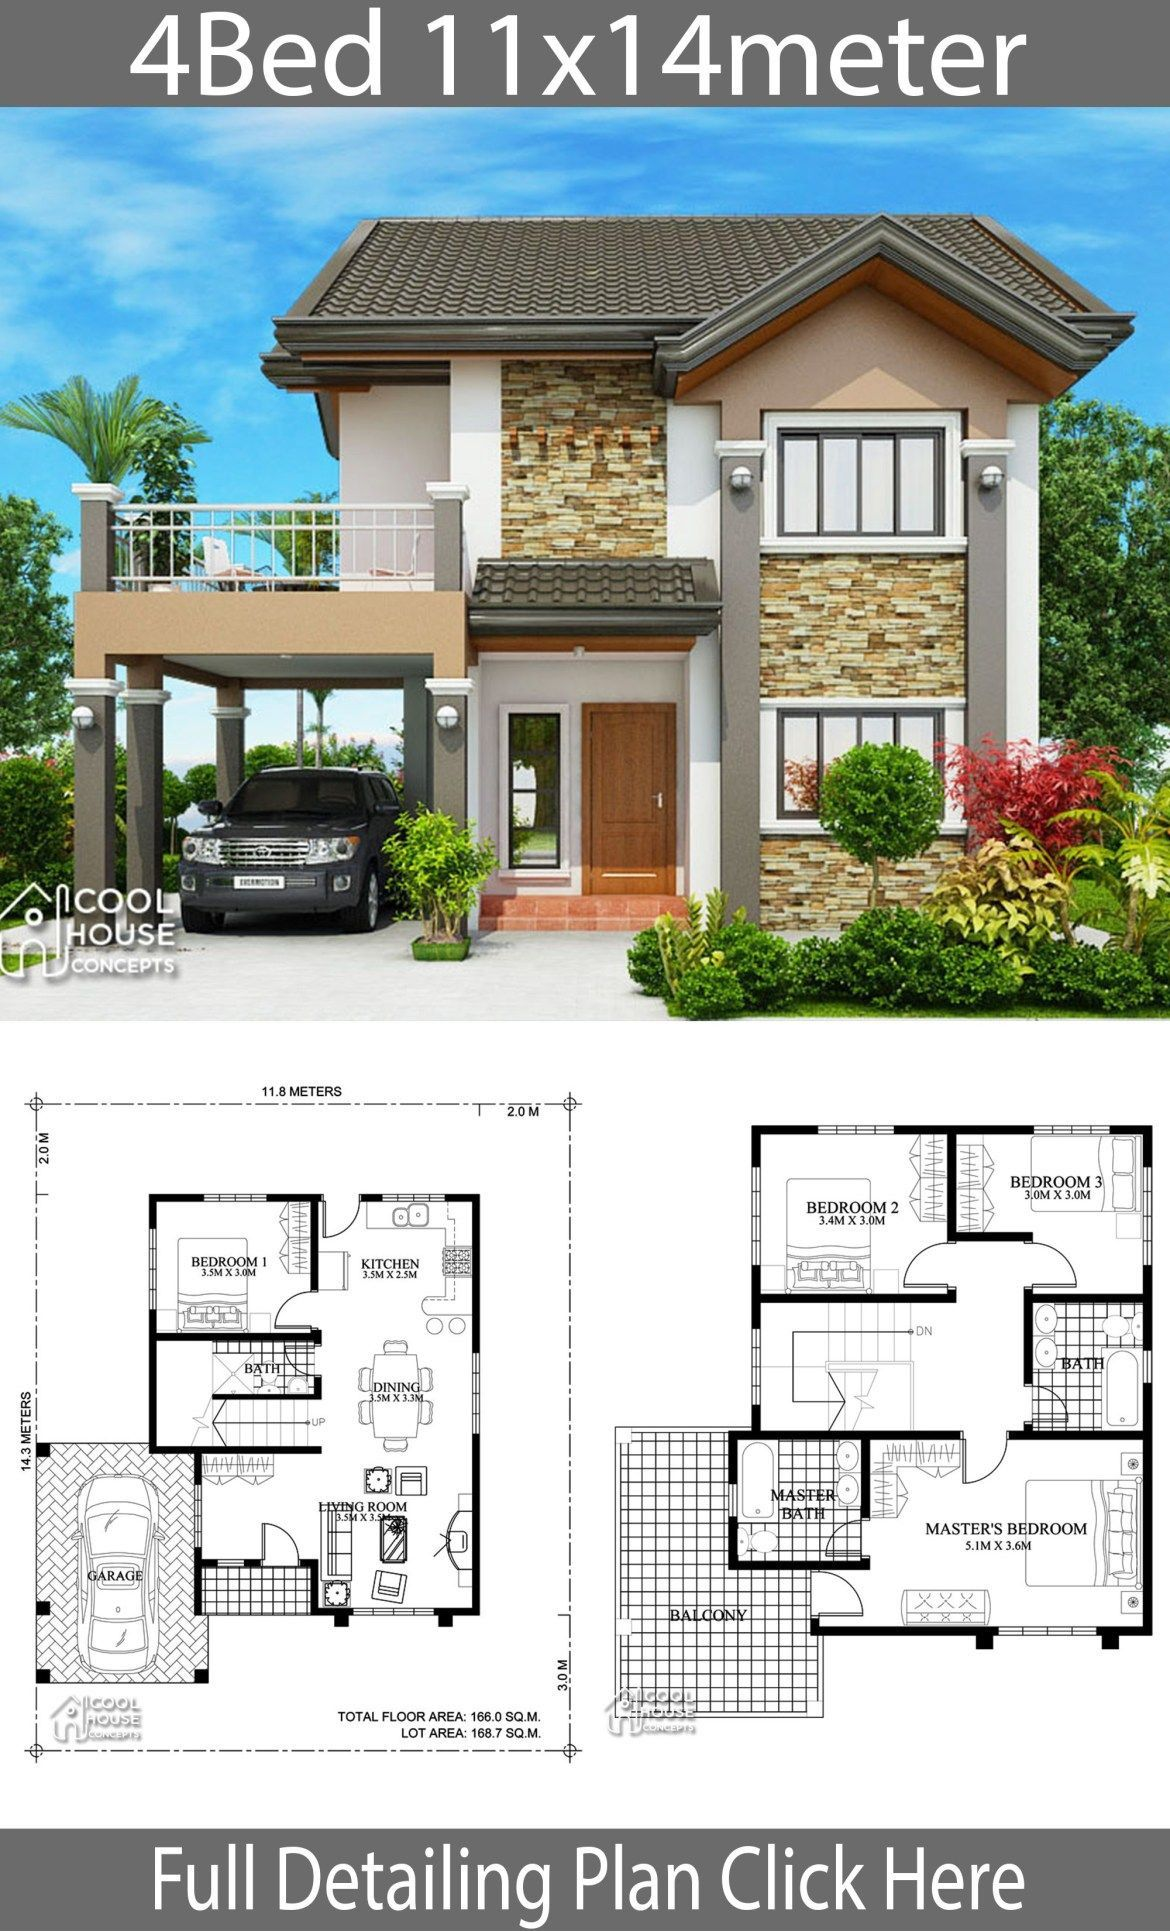 New House Plans With Photos 2020 Arsitektur Rumah Indah Desain Arsitektur